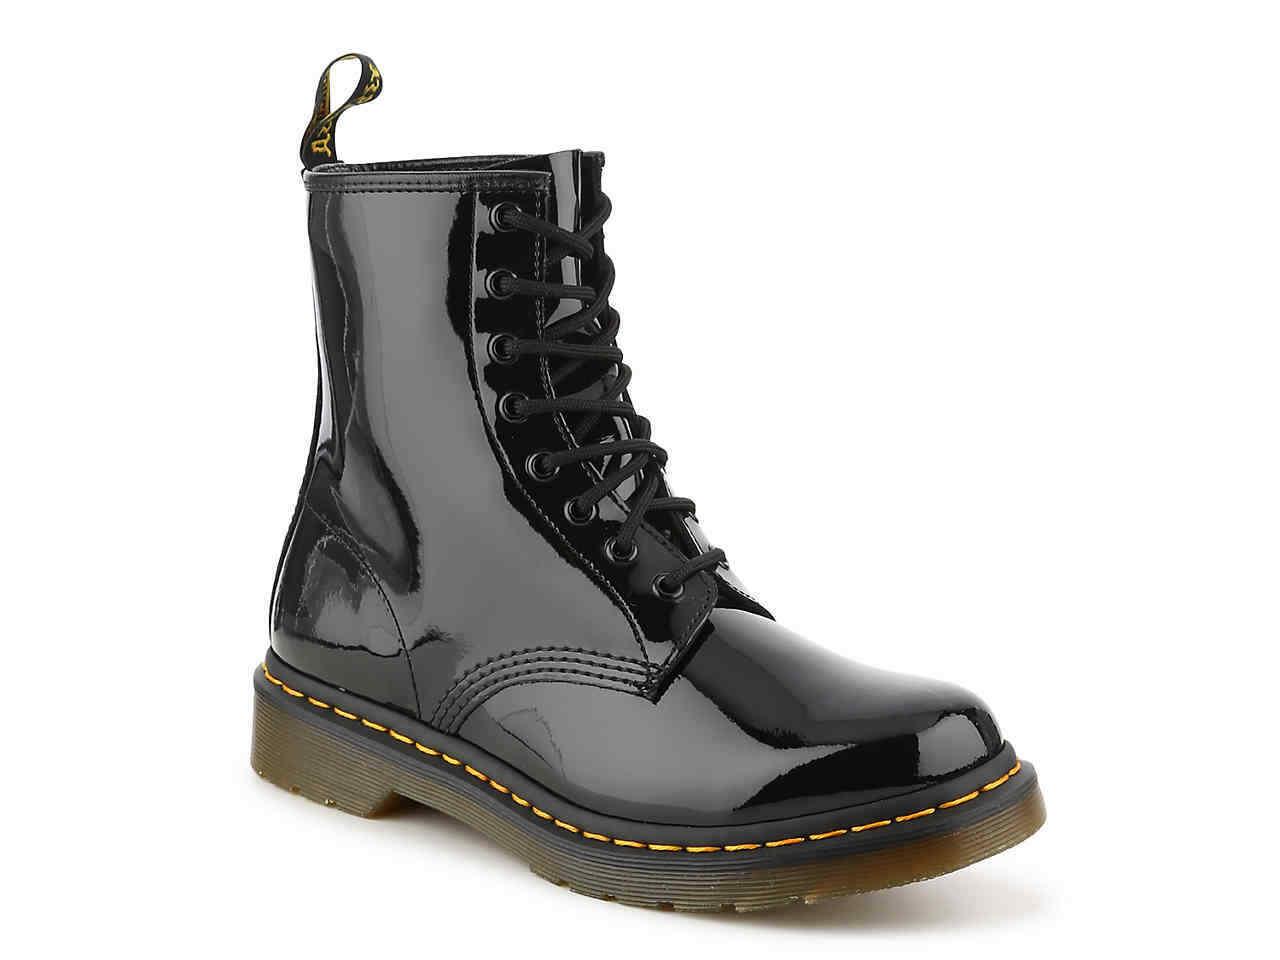 Women's Shoes Dr. Martens 1460 8 Eye